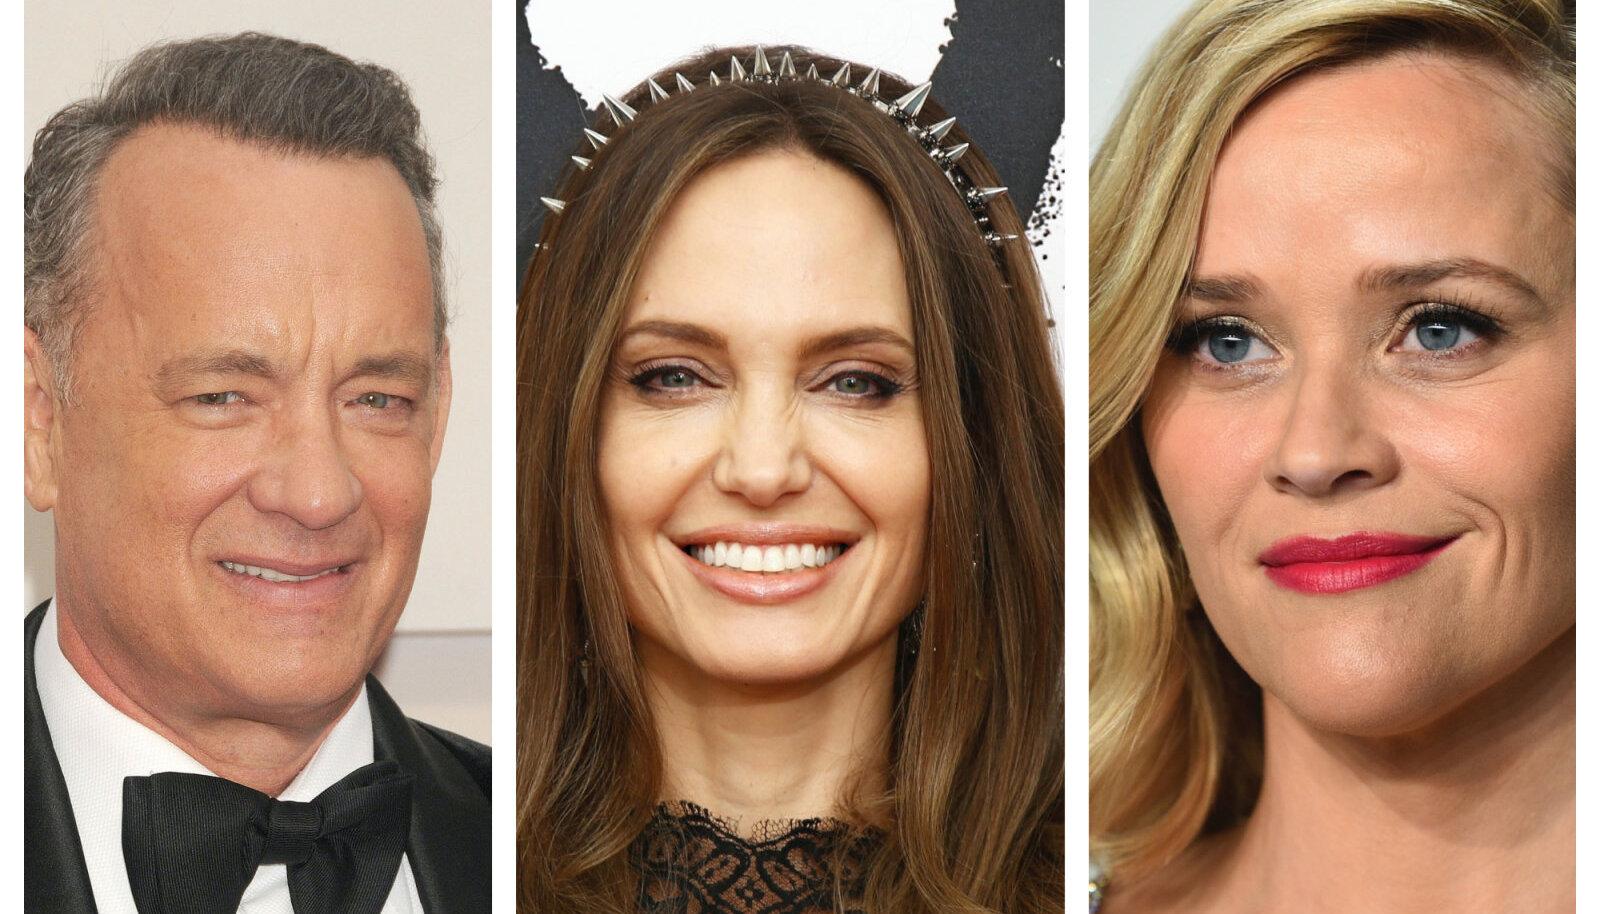 Tom Hanks, Angelina Jolie, Reese Witherspoon